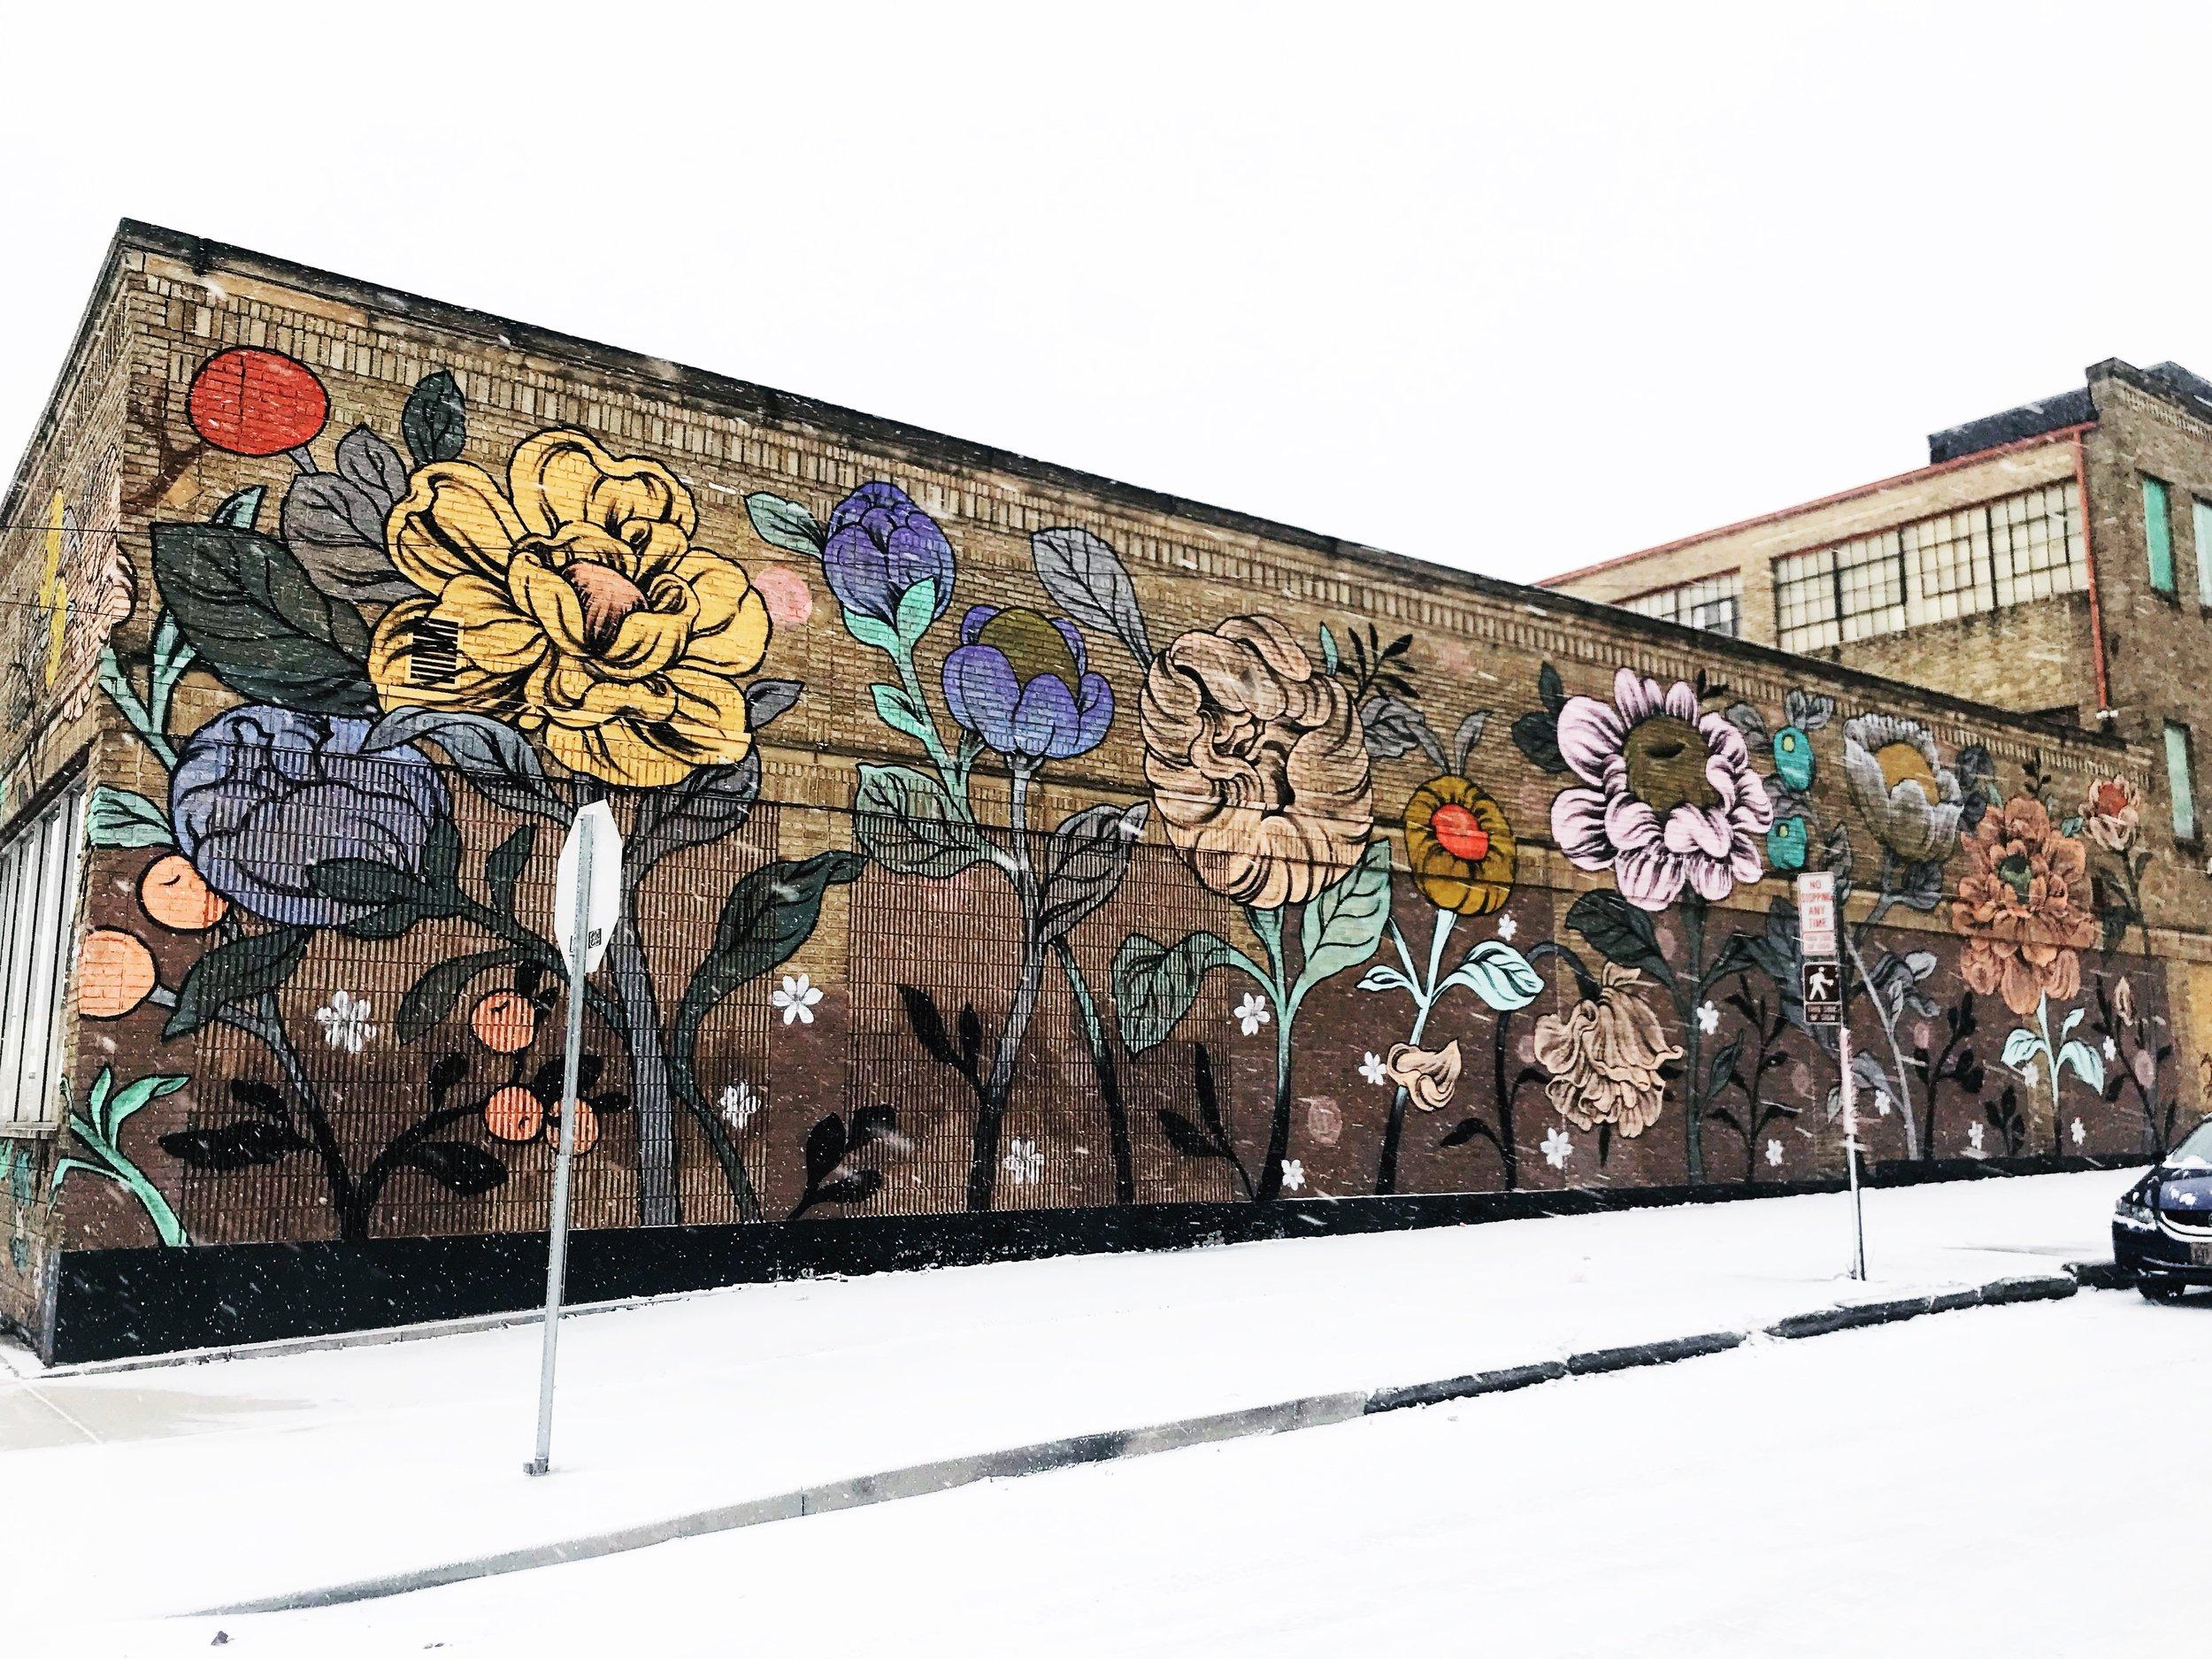 Mural by Ouizi on the side of Handmade Toledo's building. Photo credit Elizabeth Rogers Drouillard.